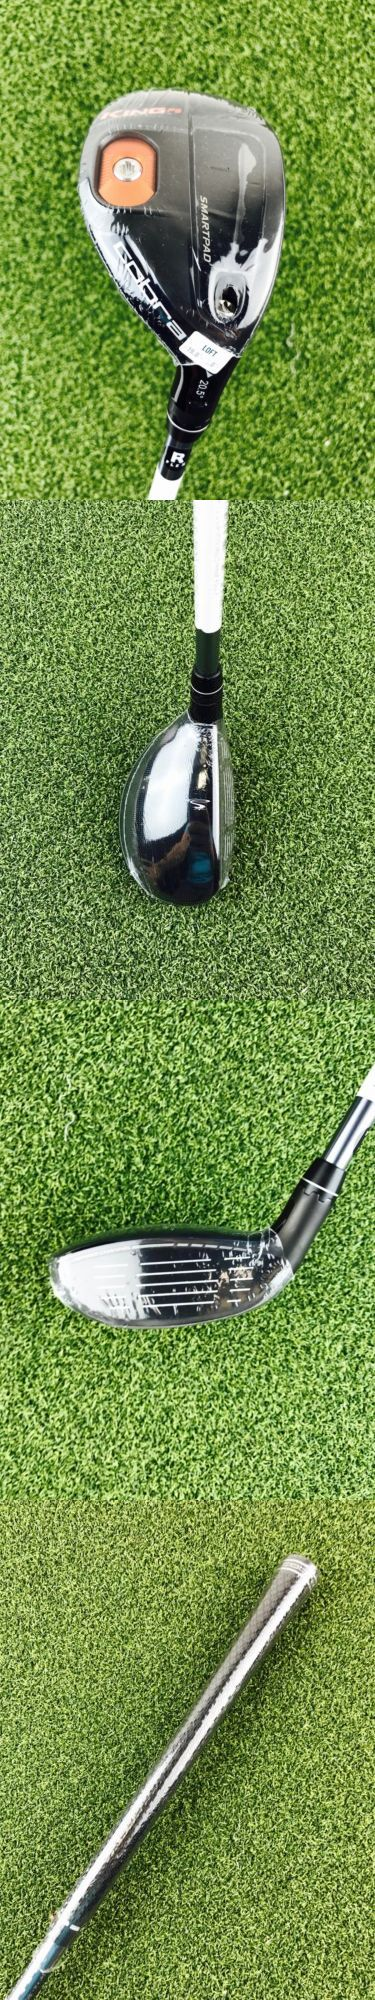 Golf Clubs 115280: New Cobra Golf King F6 3-4 Hybrid Regular Flex, Rh -> BUY IT NOW ONLY: $99.99 on eBay!